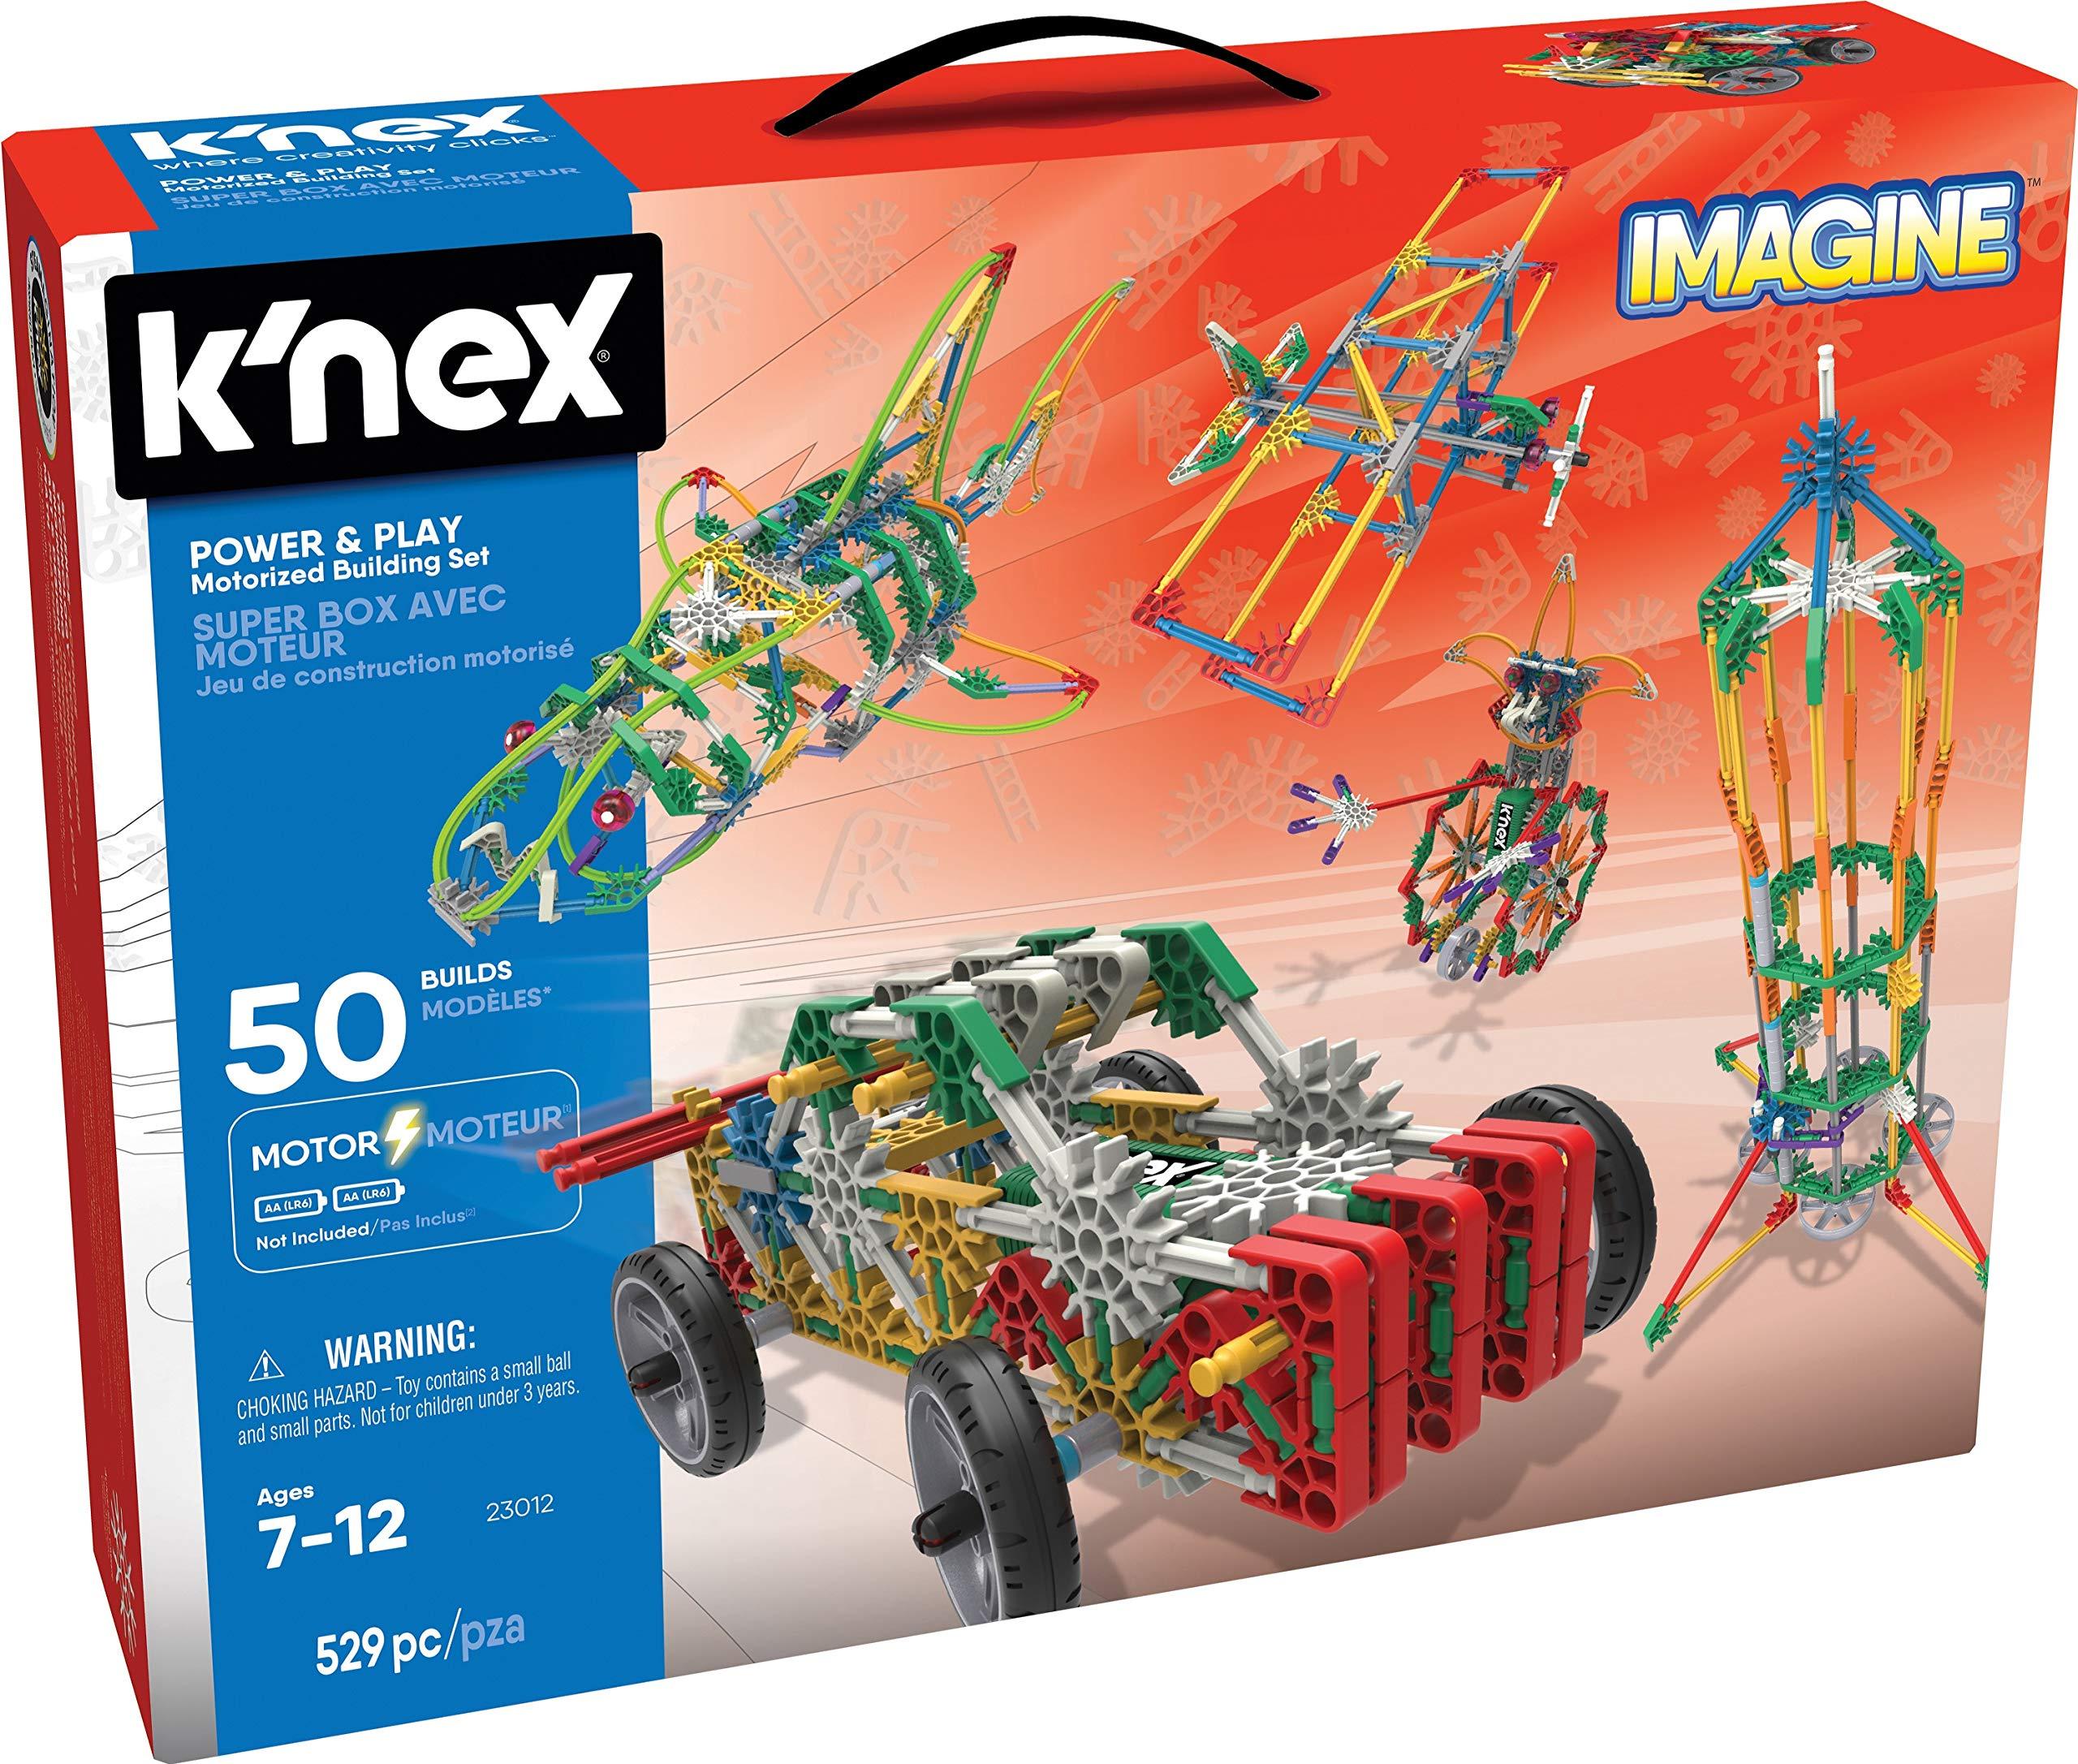 K/'Nex 25525 Imagine 12 Model Cars Building Set Engineering Education Toy New